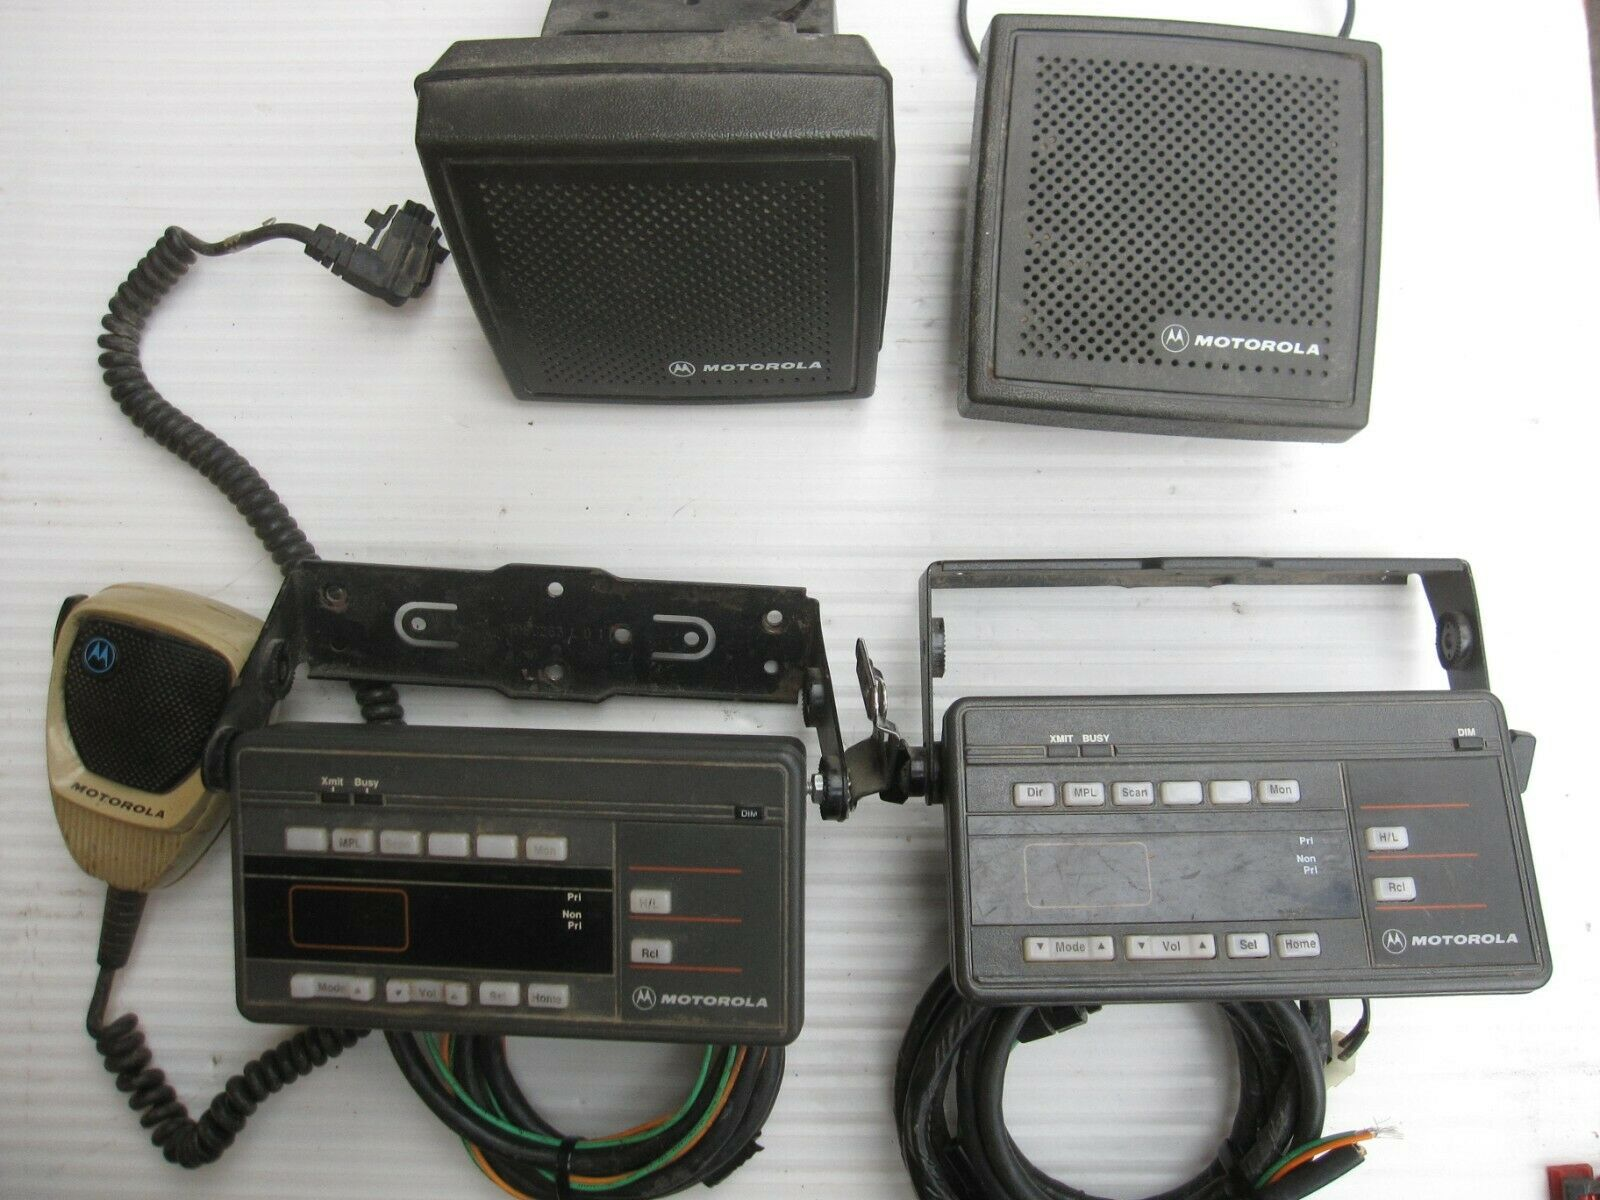 Mixed Lot Motorola Maratrac HCN1089A(2),HSN4021A/B Speaker(2),HMN1061A. Buy it now for 70.00